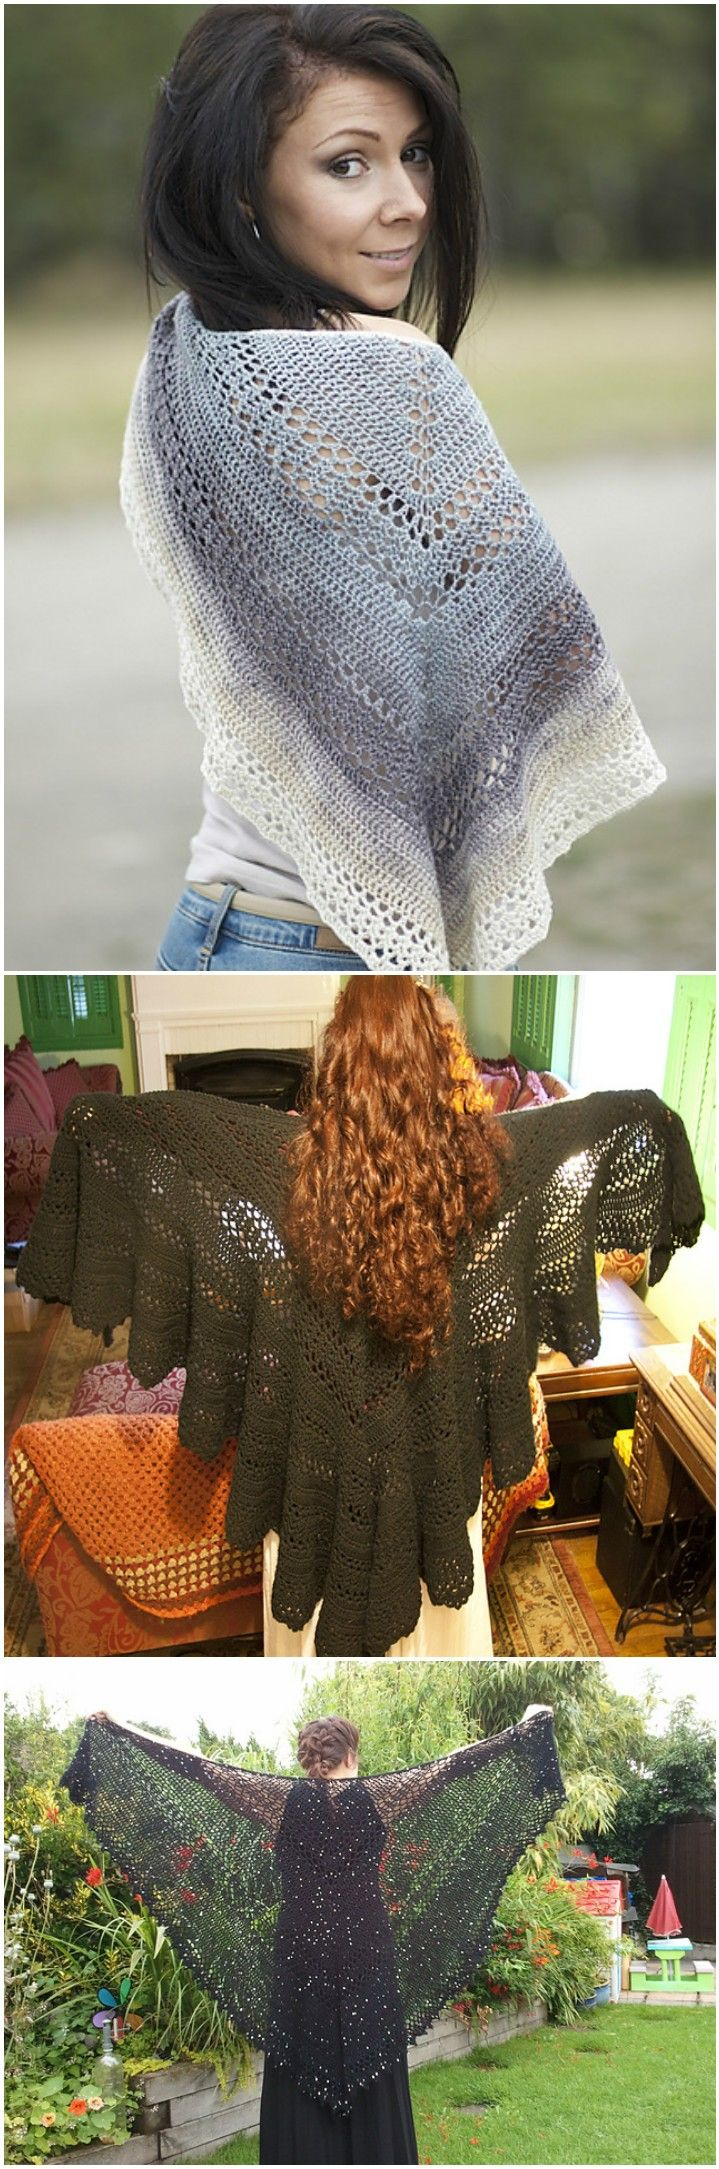 100 Free Crochet Shawl Patterns - Free Crochet Patterns   Crochet ...